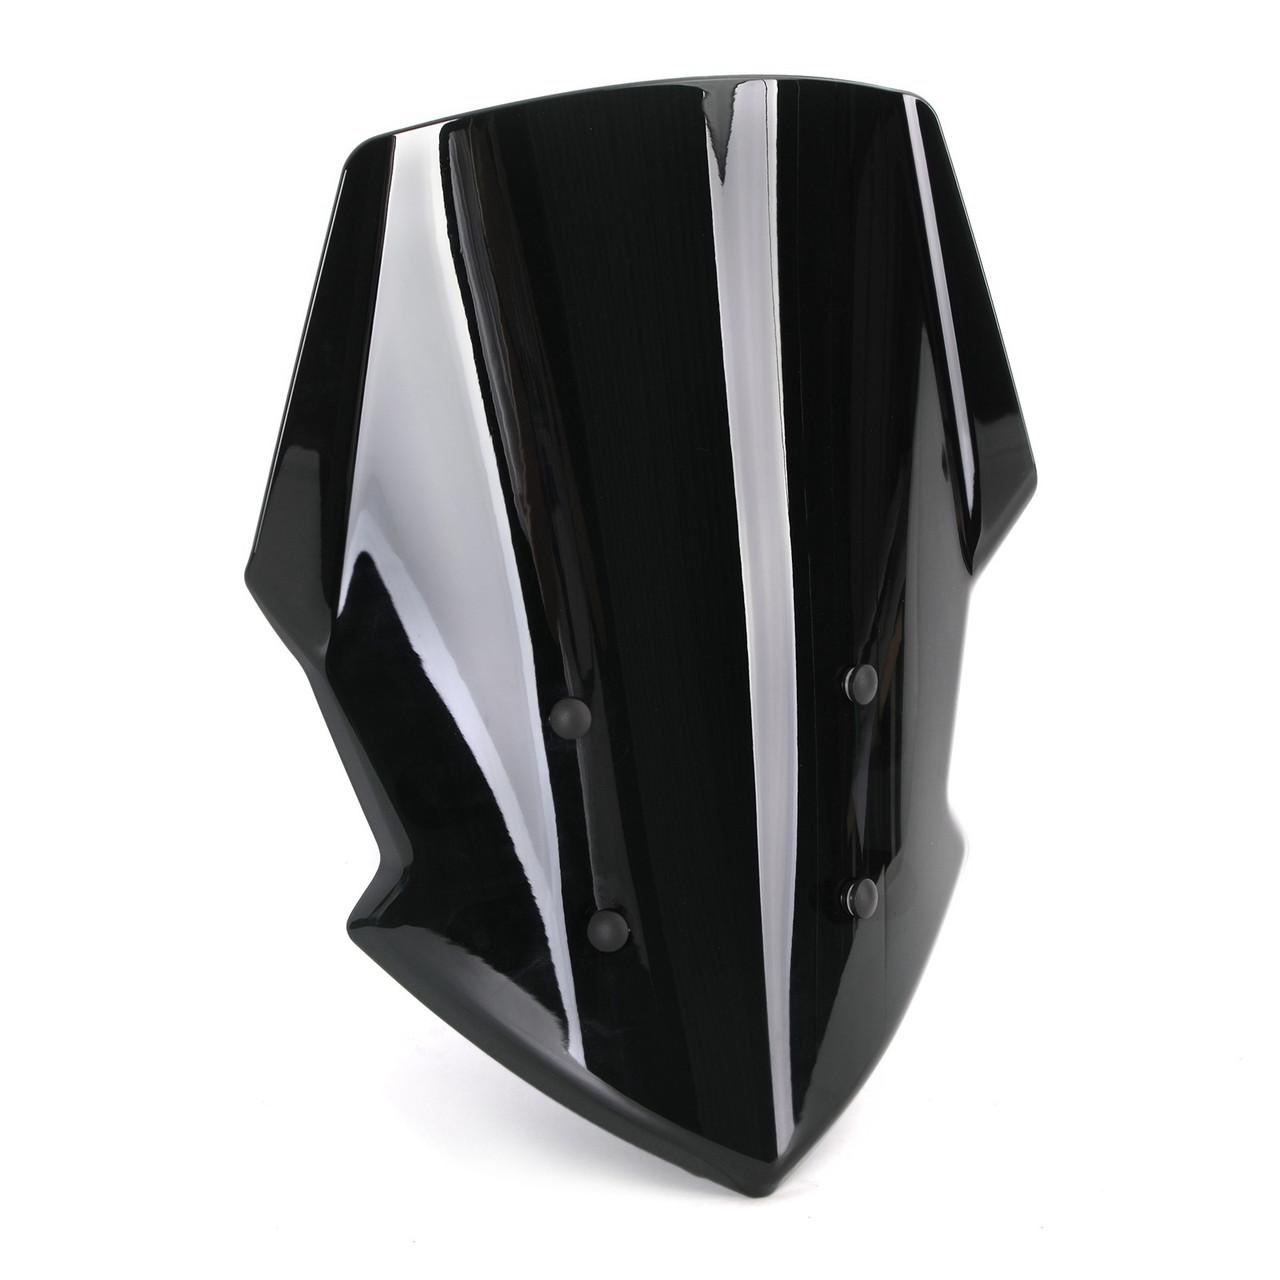 Windshield Fit for Yamaha MT-15 18-20 Black